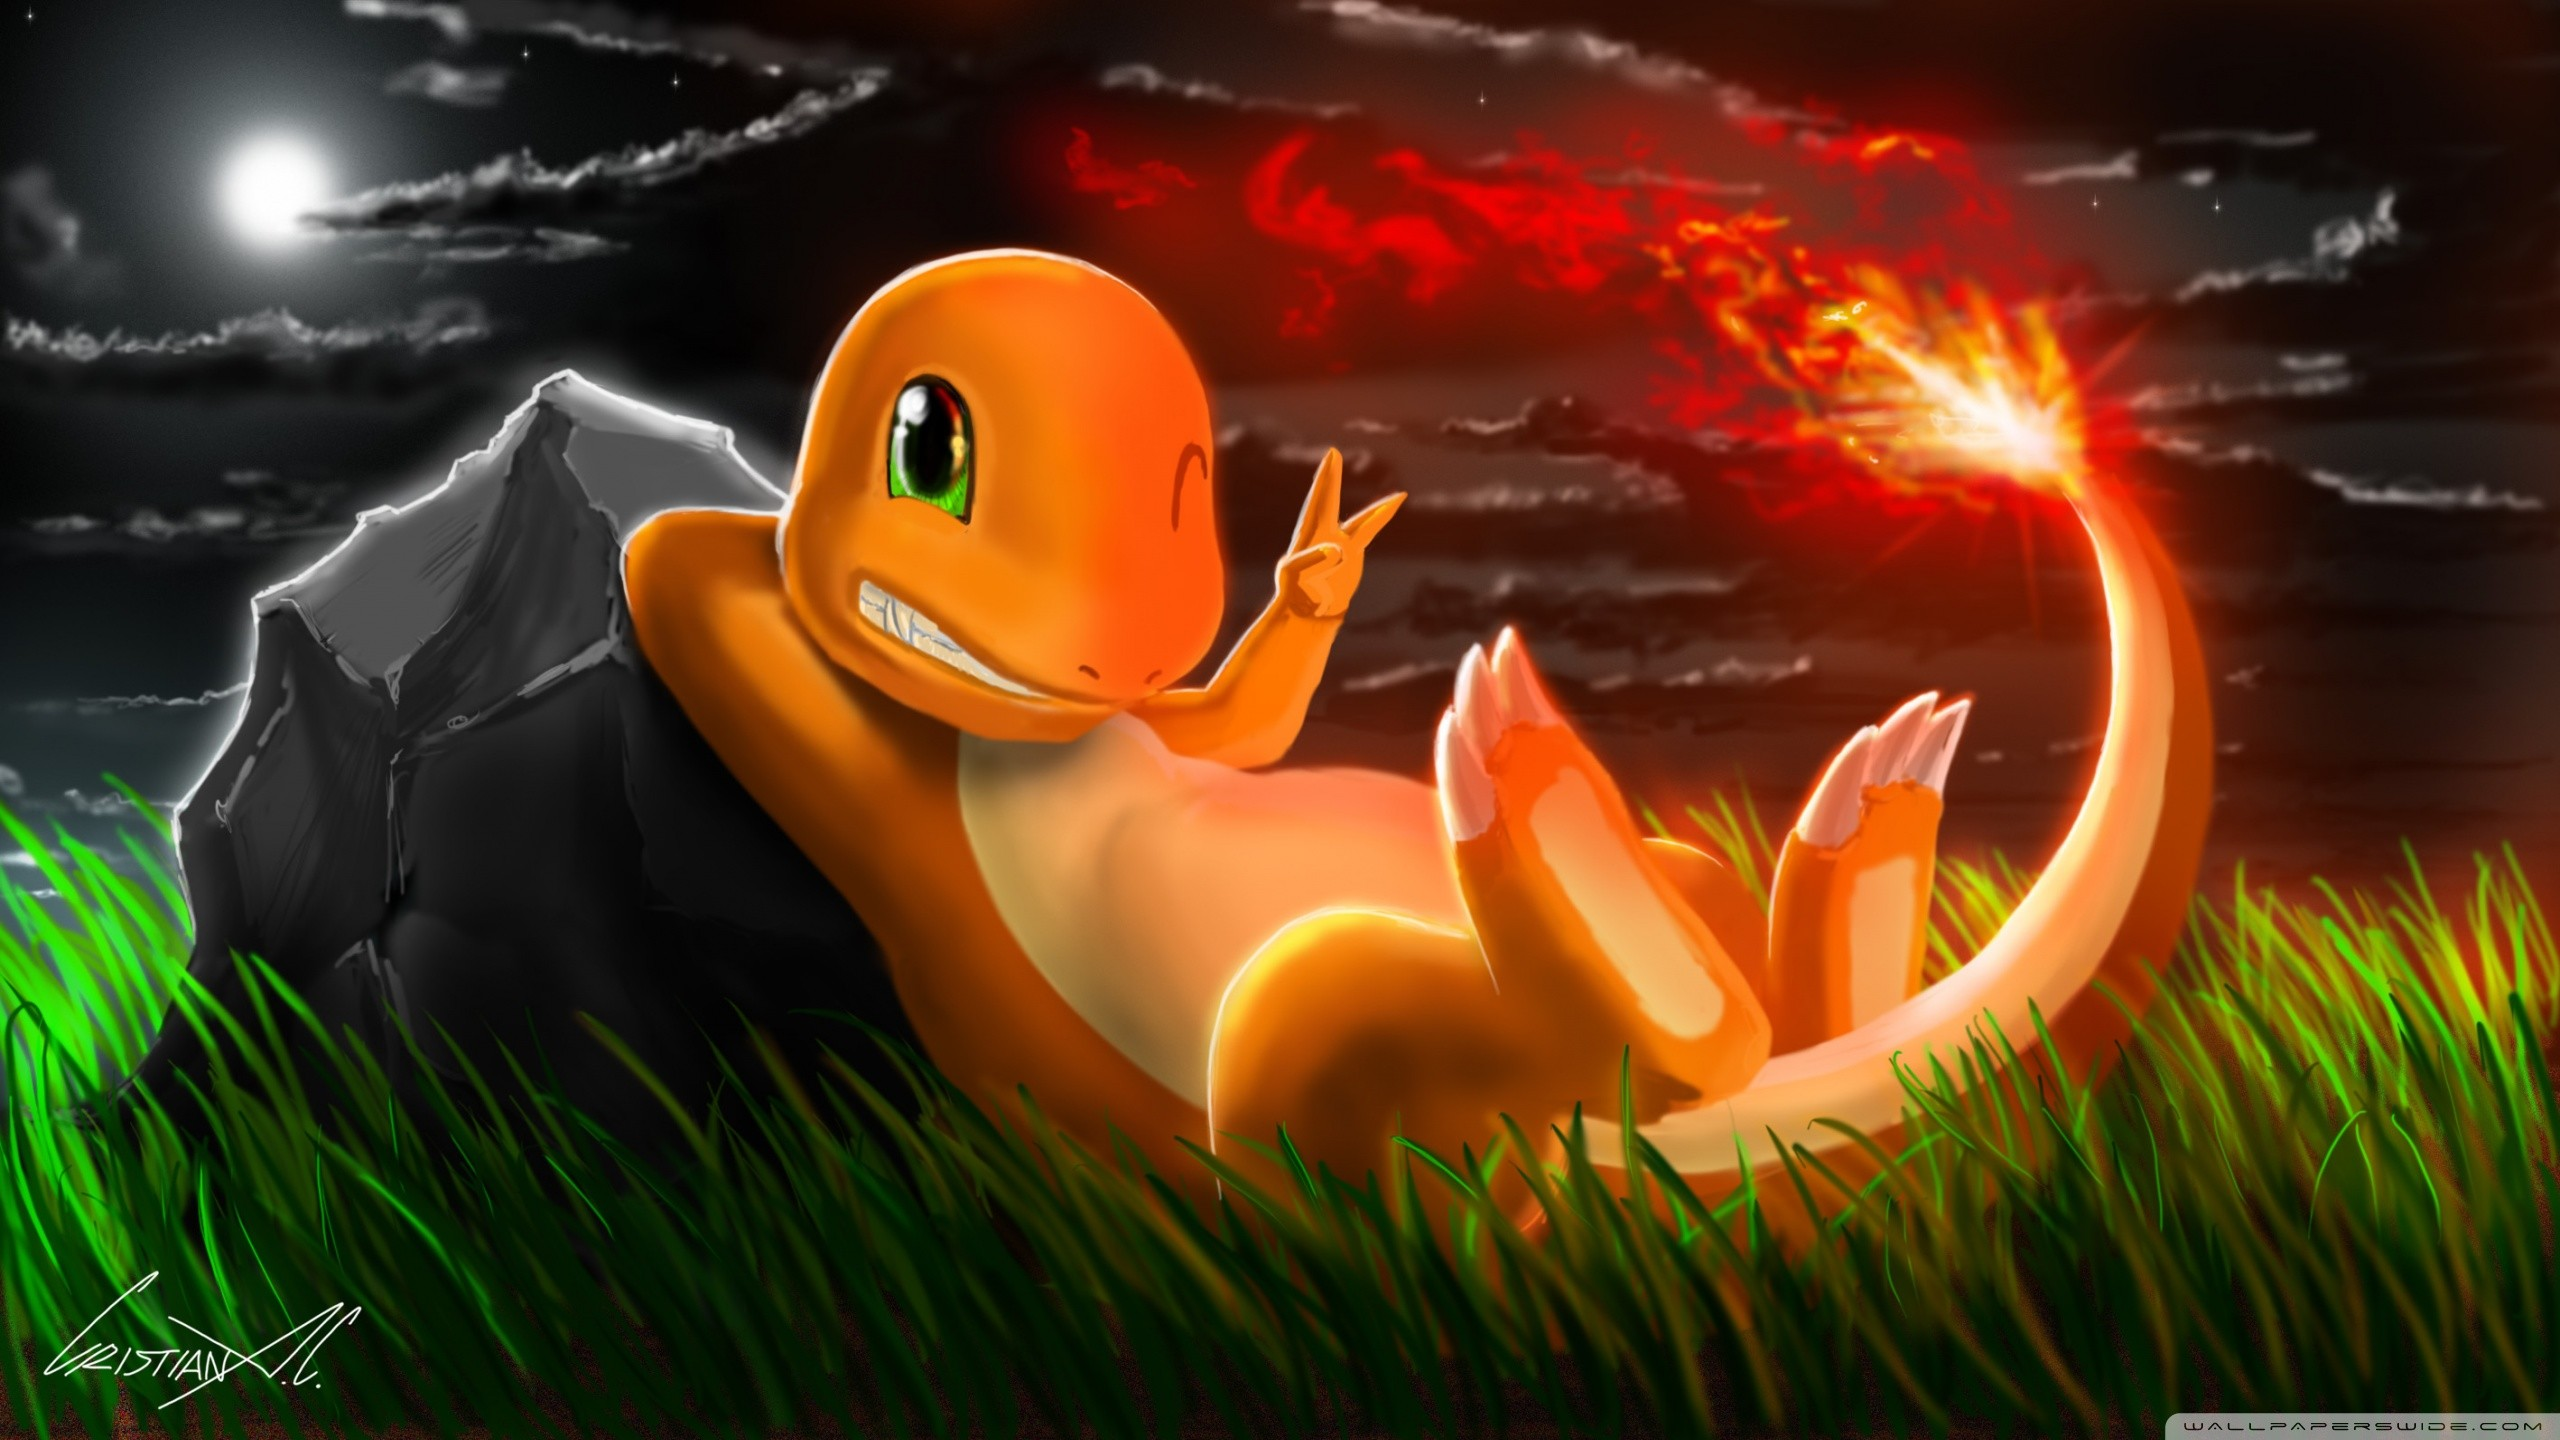 Pokemon Wallpaper 2560x1440 79 Images